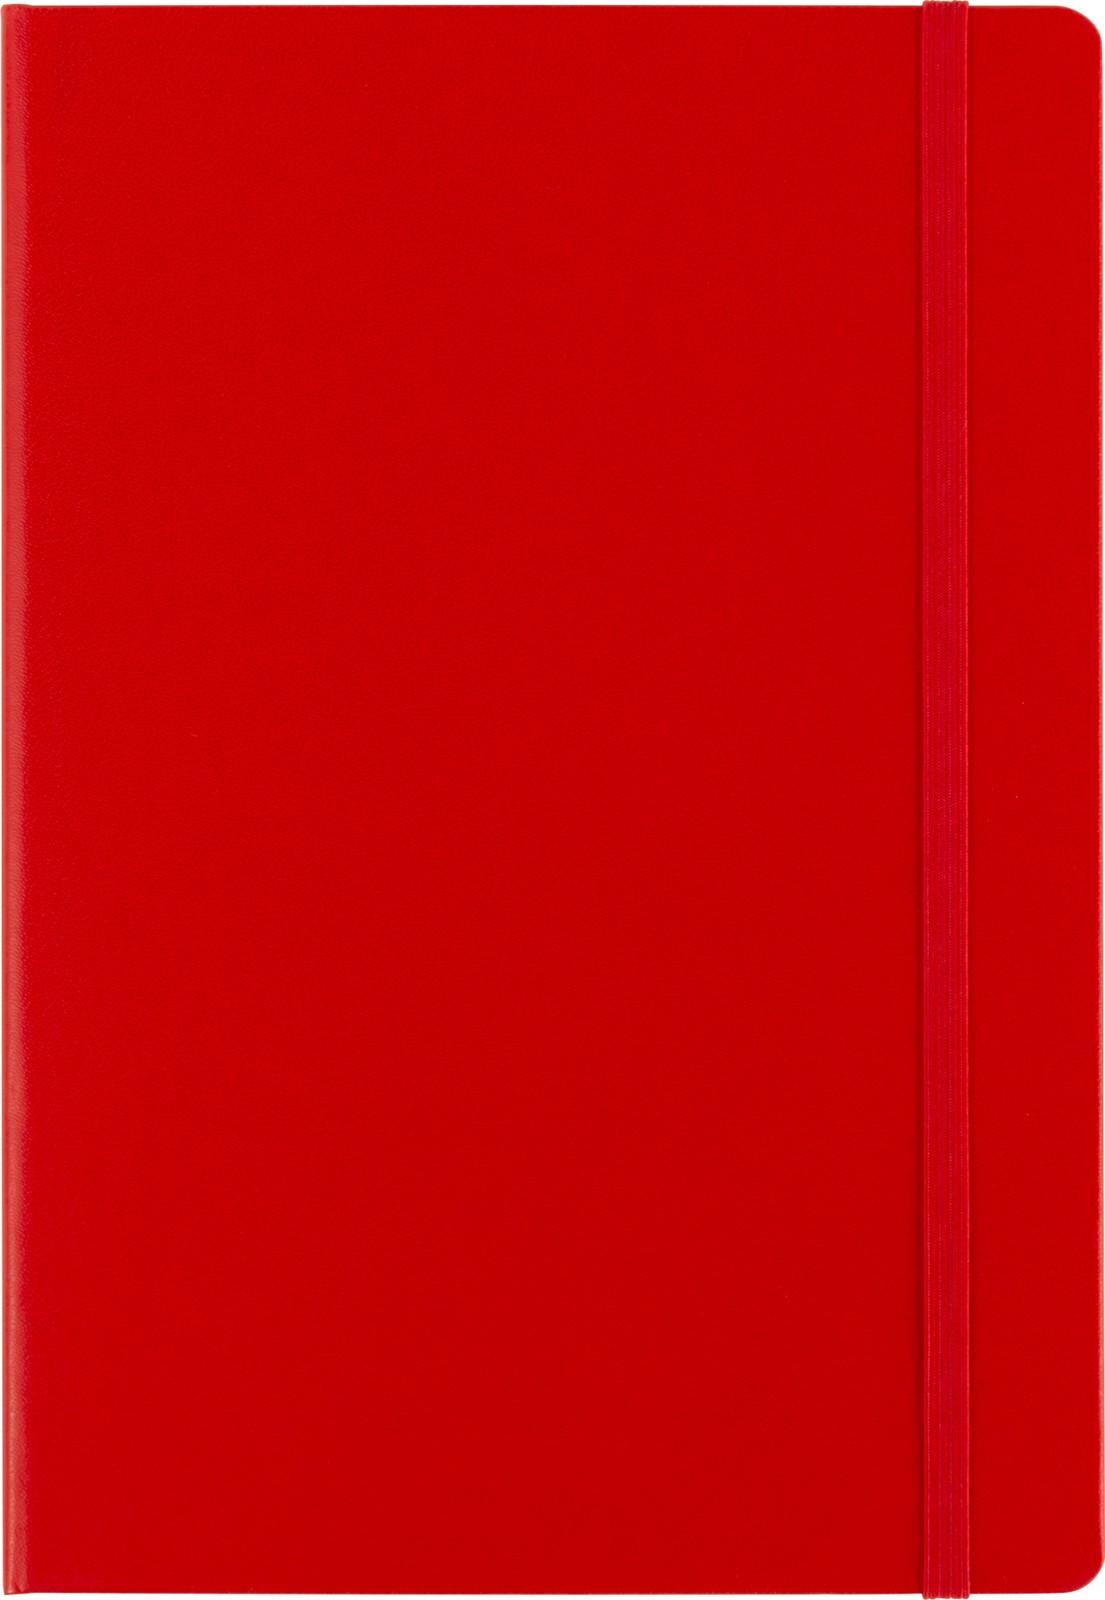 Cardboard notebook - Red